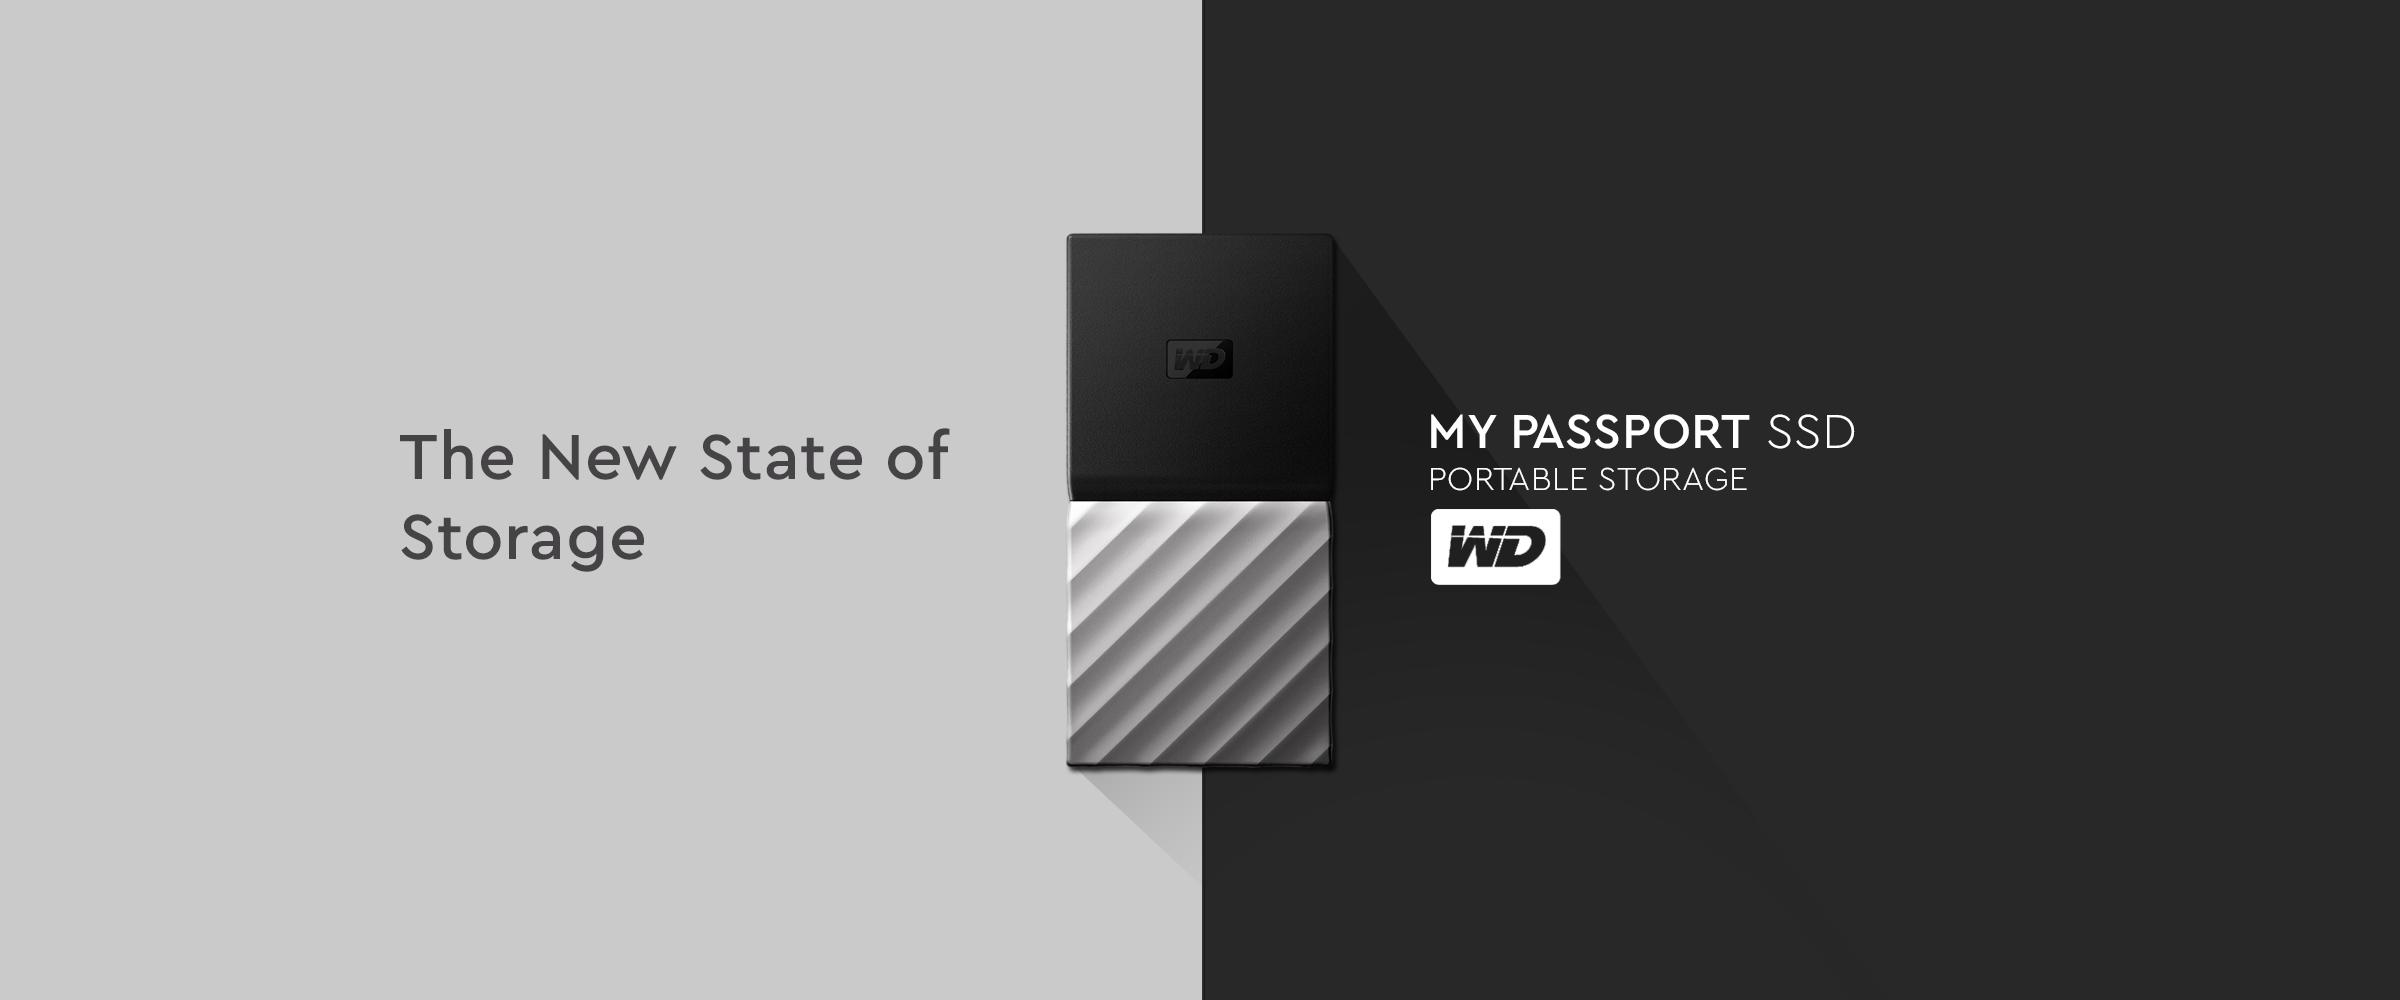 WD My Passport SSD Portable Storage